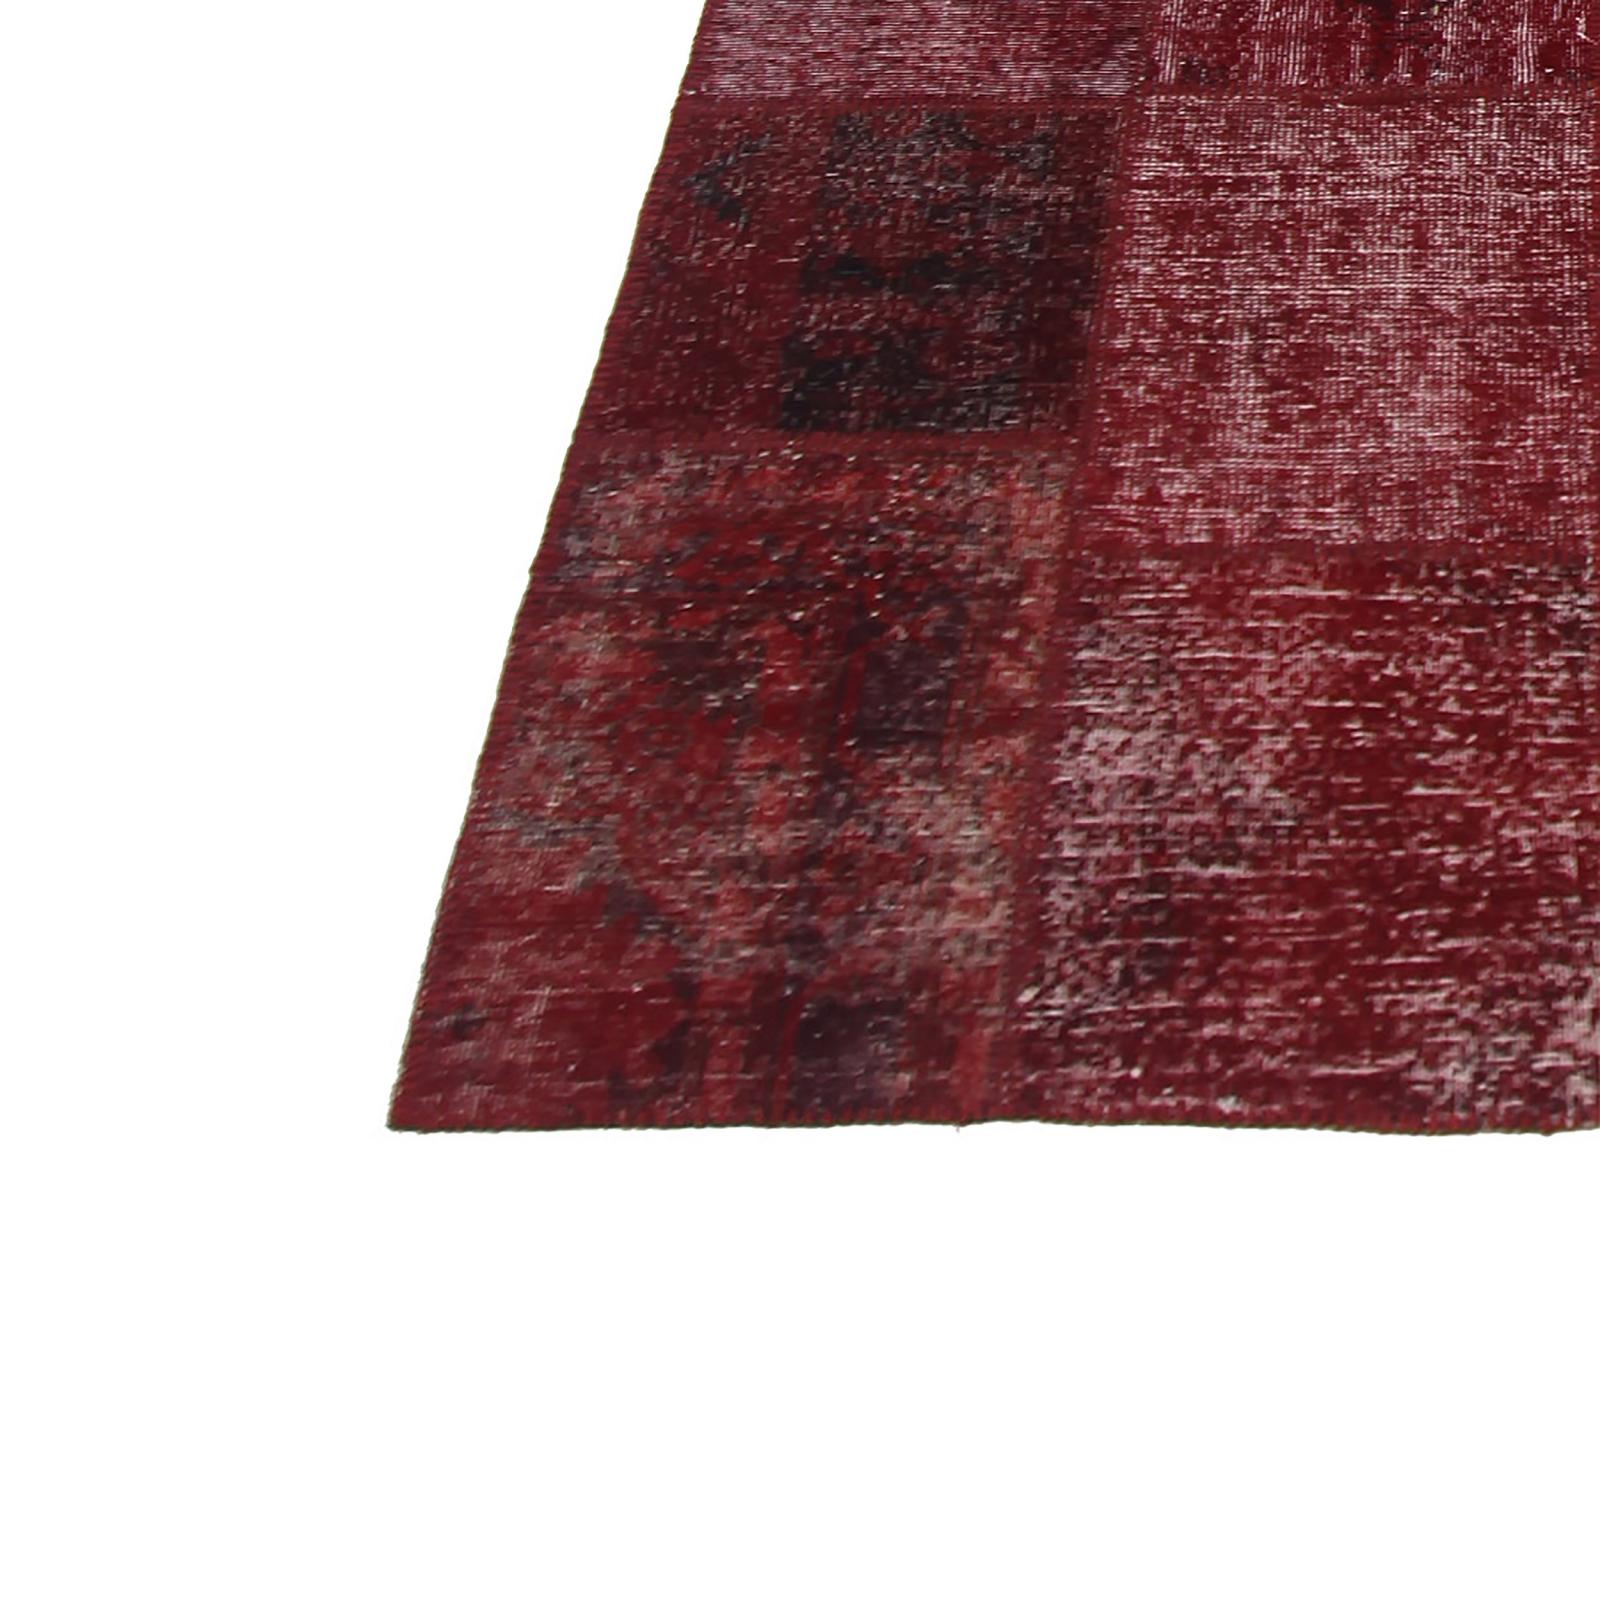 Teppich Wohnzimmer Bordeaux Teppich Grau Rot Jamgo Co